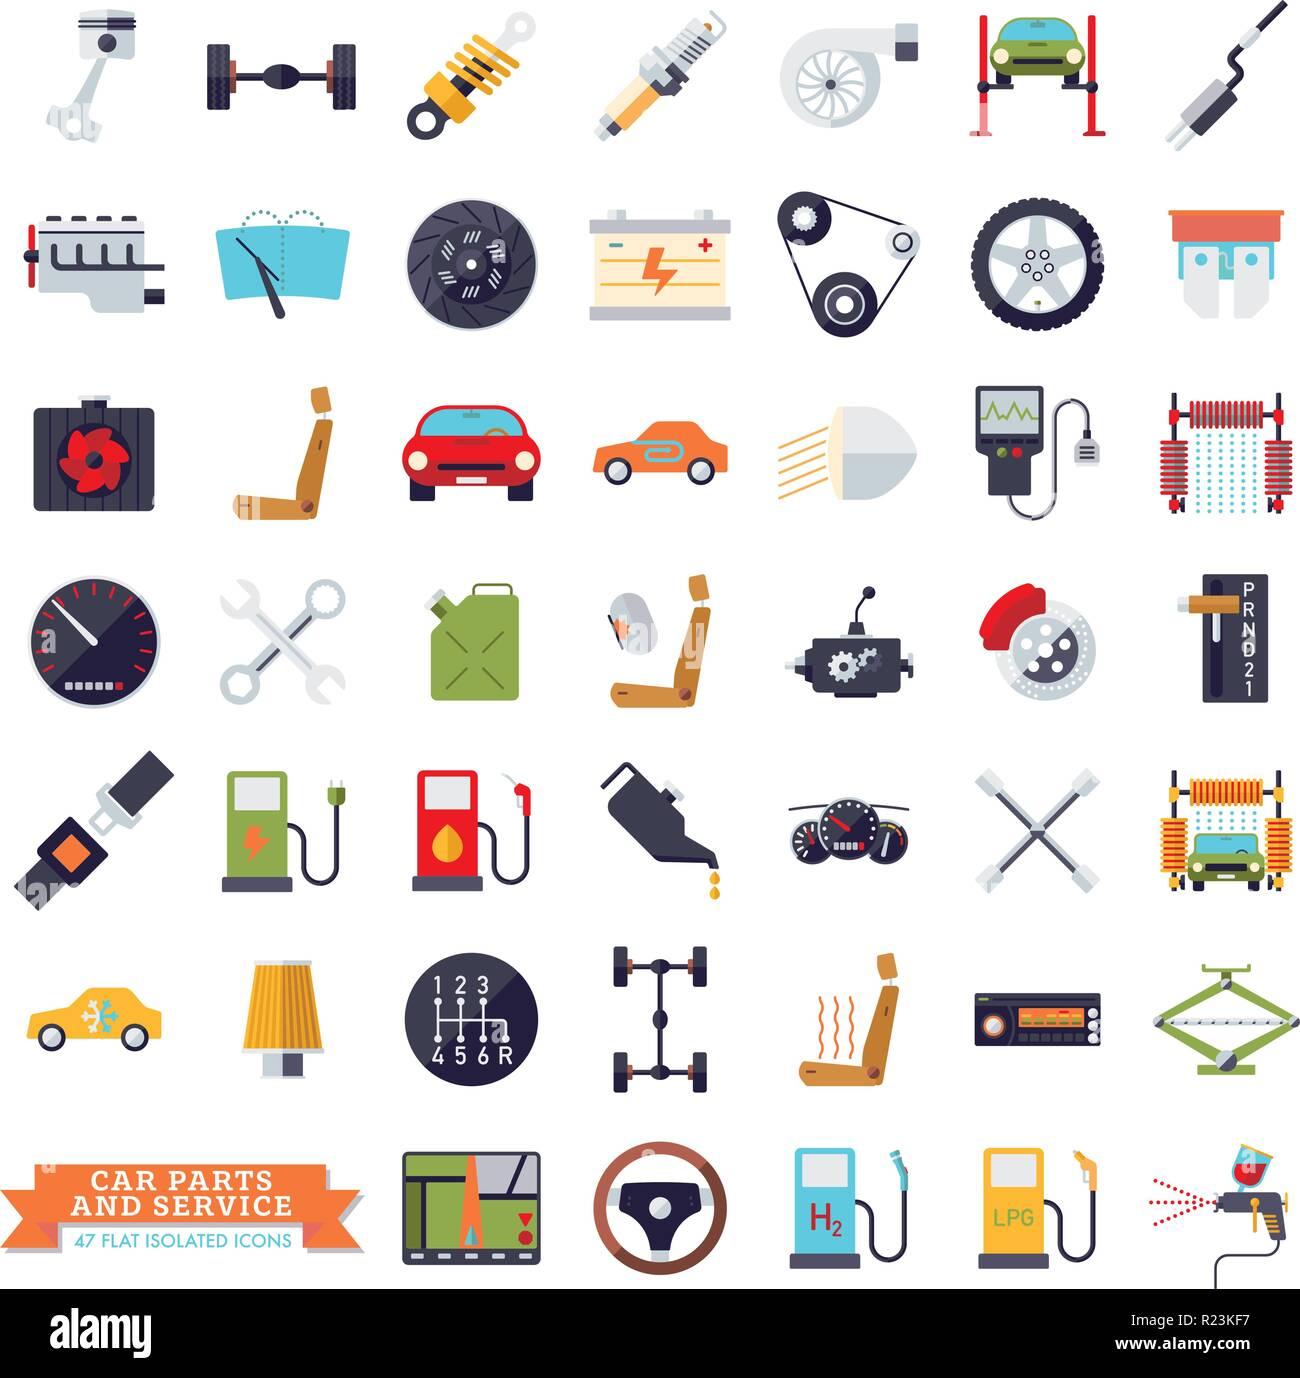 car parts illustration stock photos car parts. Black Bedroom Furniture Sets. Home Design Ideas